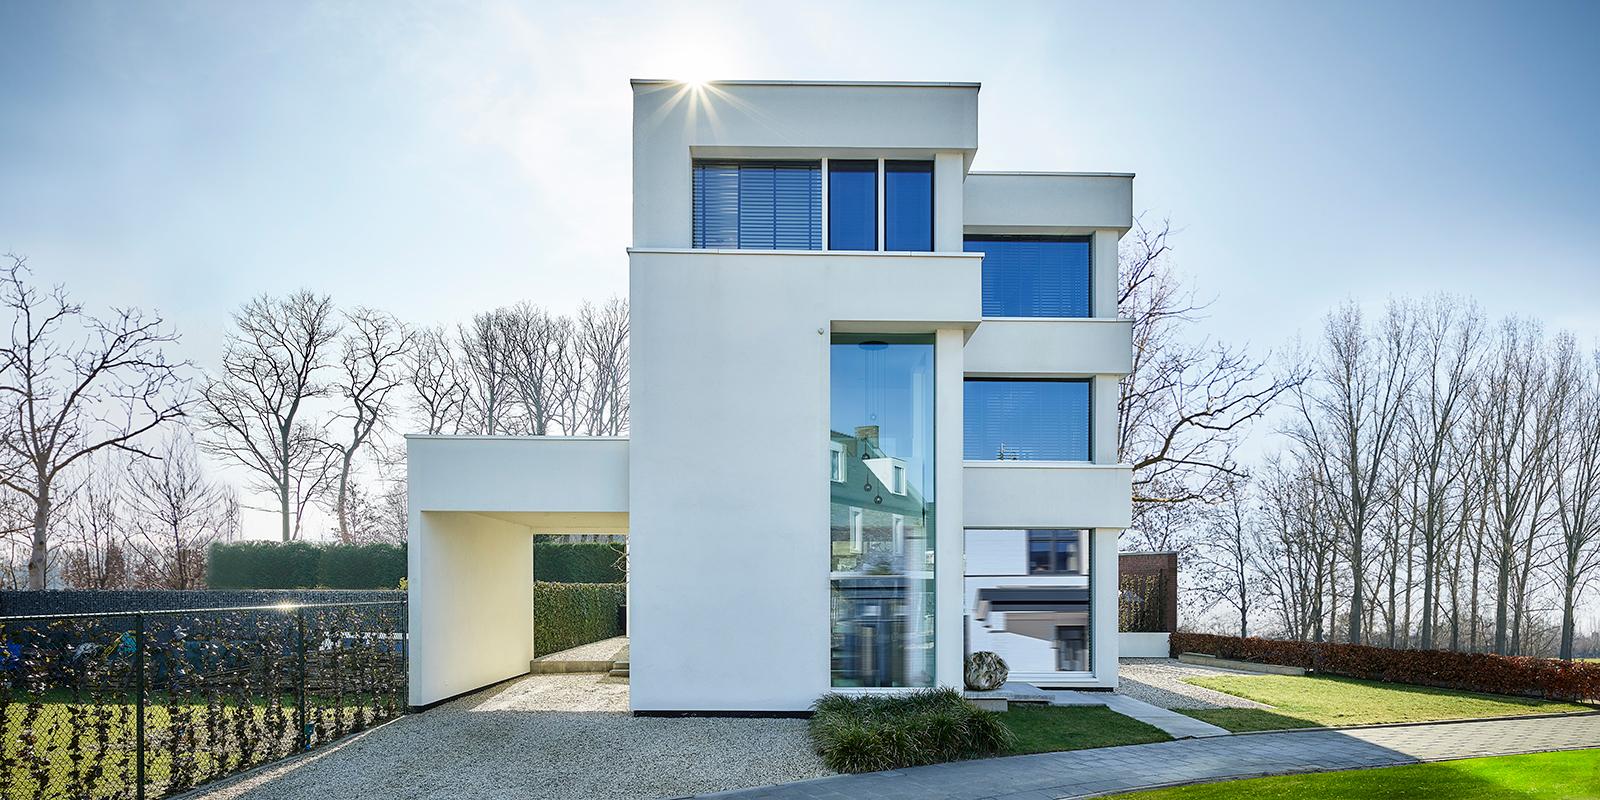 Nieuwbouwwoning, Bob Manders, luxe architectuur, modern, wit, glaspartijen, veel lichtinval, villa